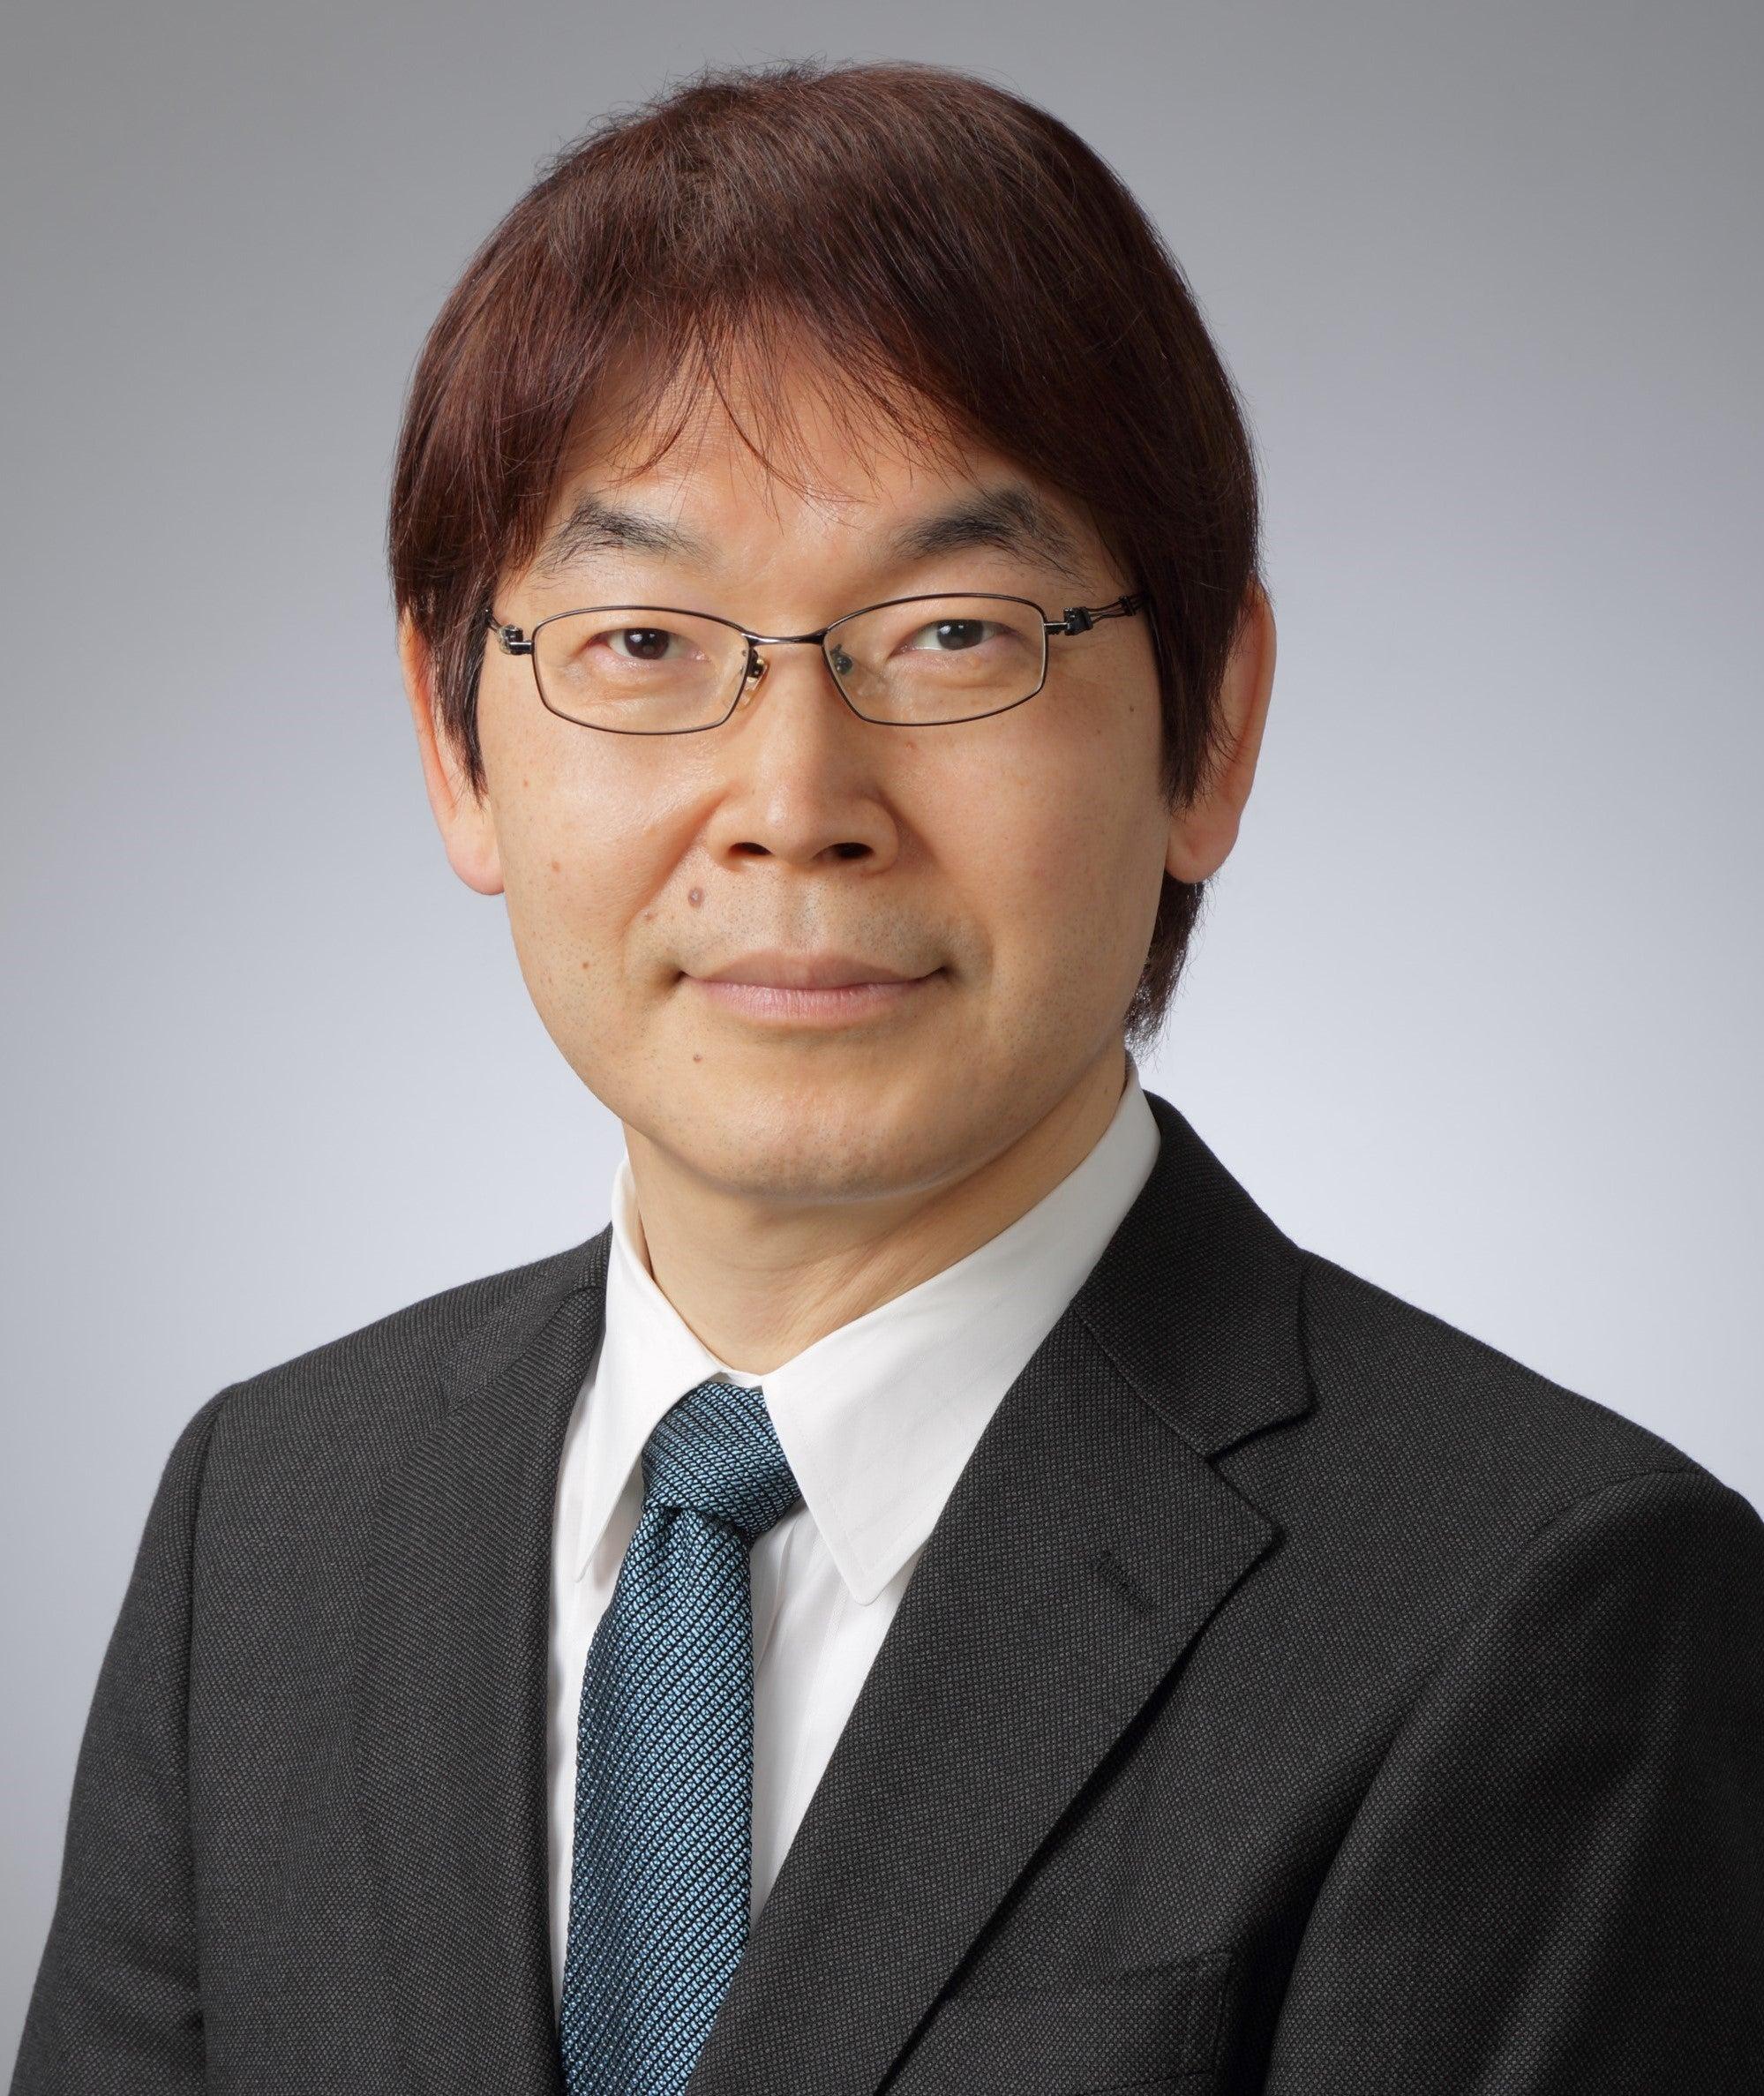 Dr. Yasuyoshi Yokokohji